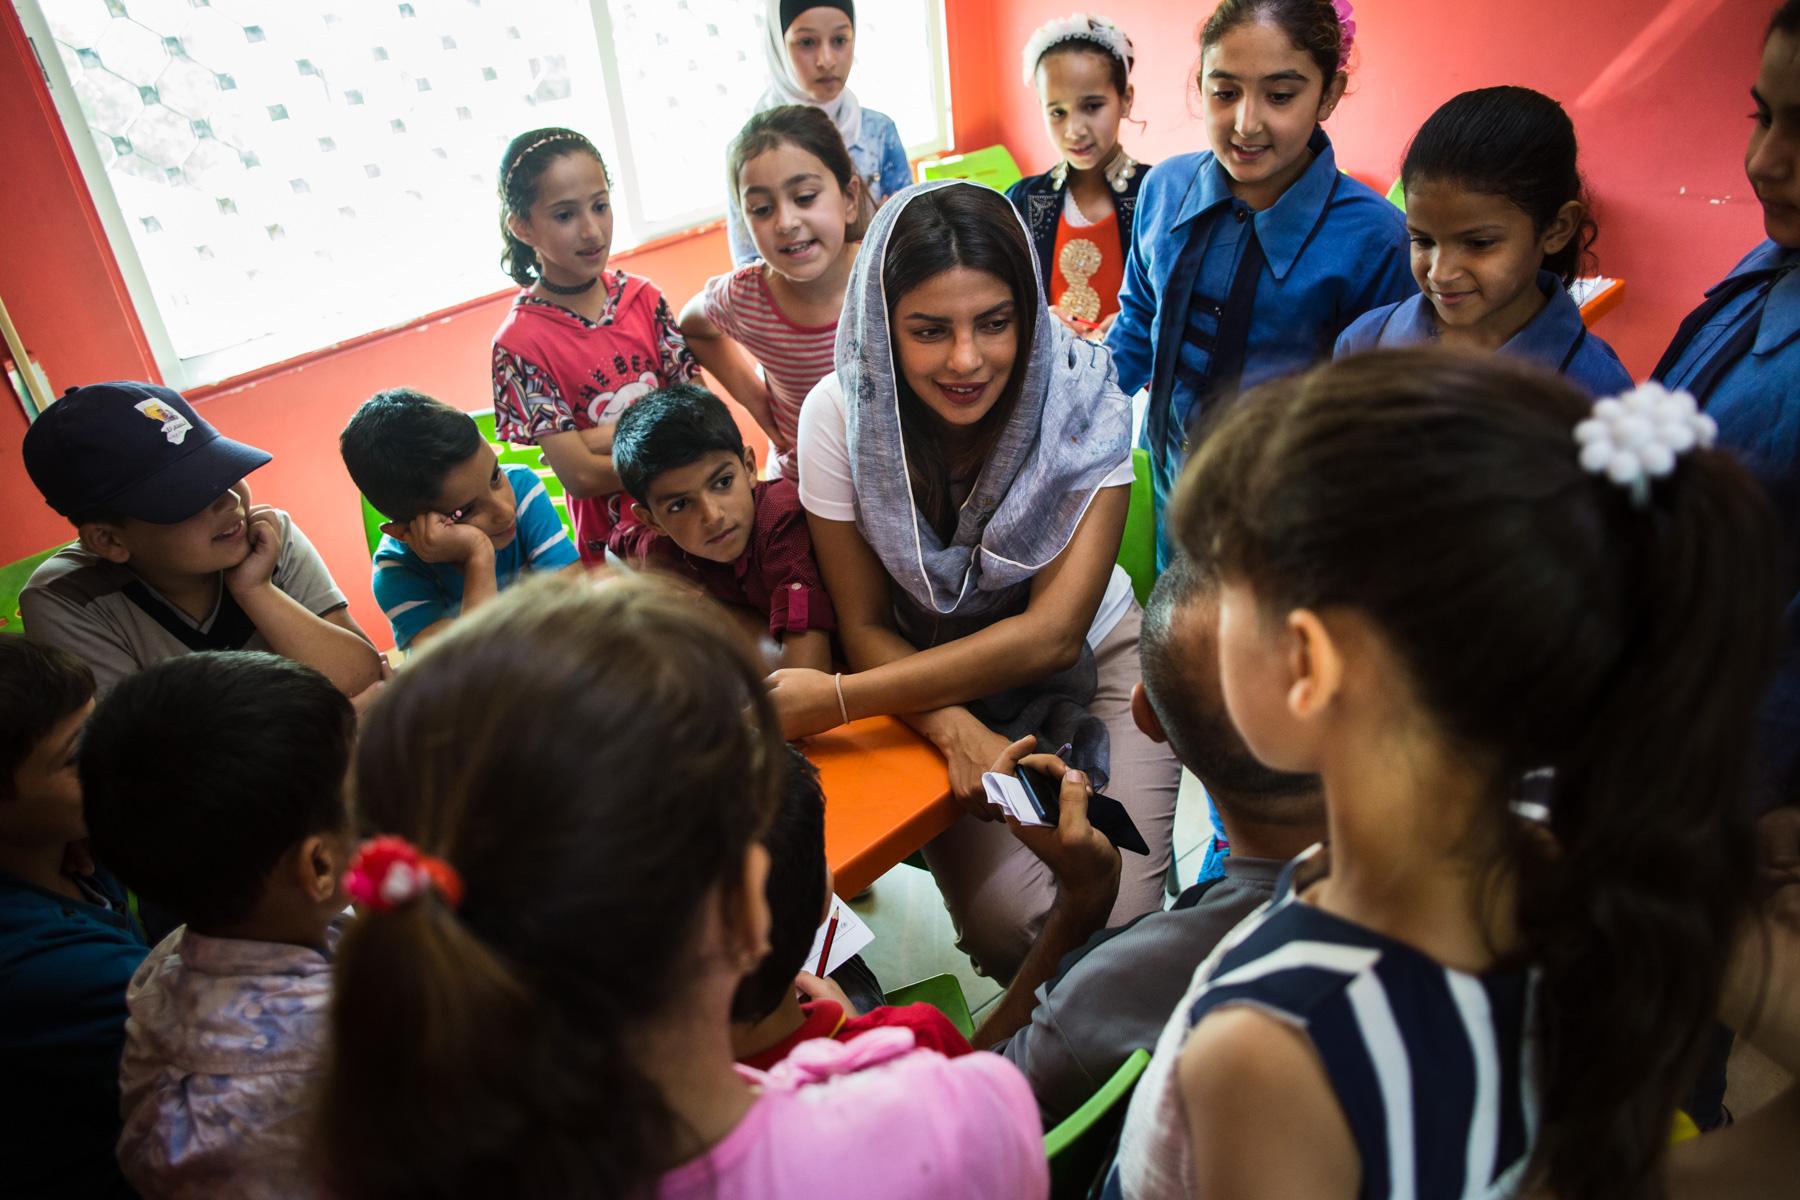 Priyanka Chopra, a UNICEF Goodwill Ambassador, meets with children at UNICEF's Makani Center in Amman, Jordan, on Sunday, Sep. 10, 2017. (AP Photo/Lindsey Leger)